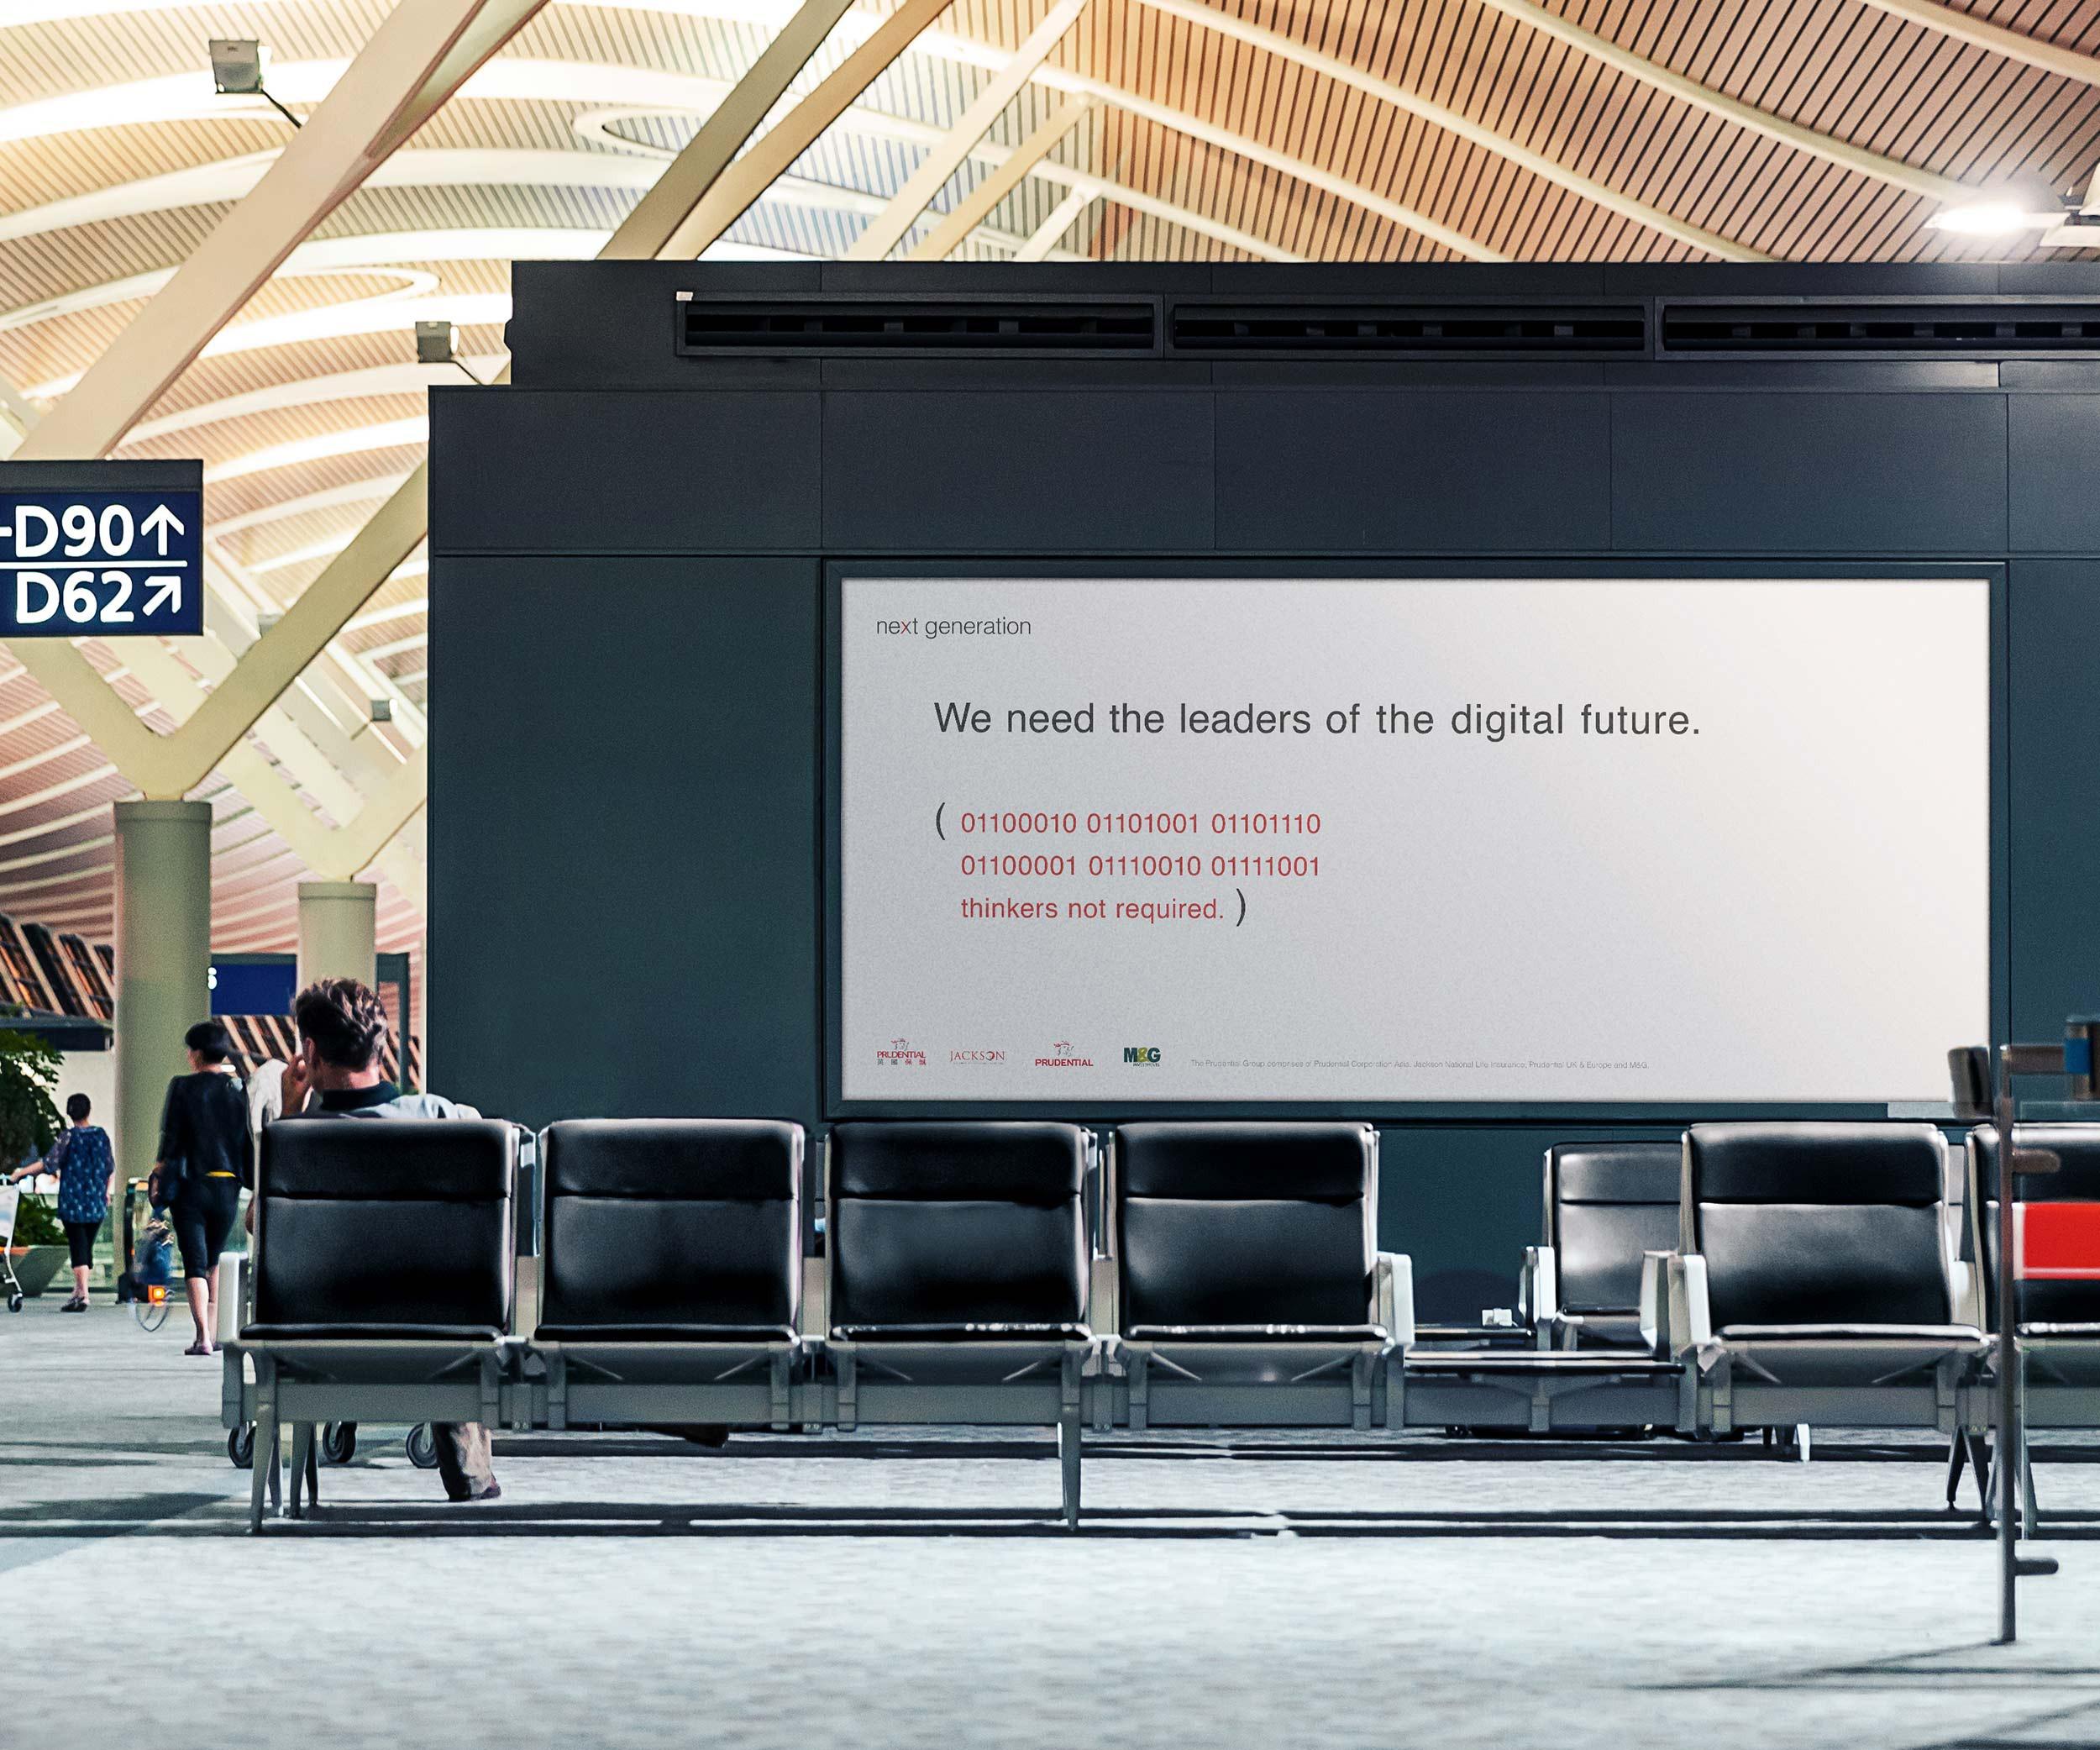 Prudential Next Generation airport advertisement